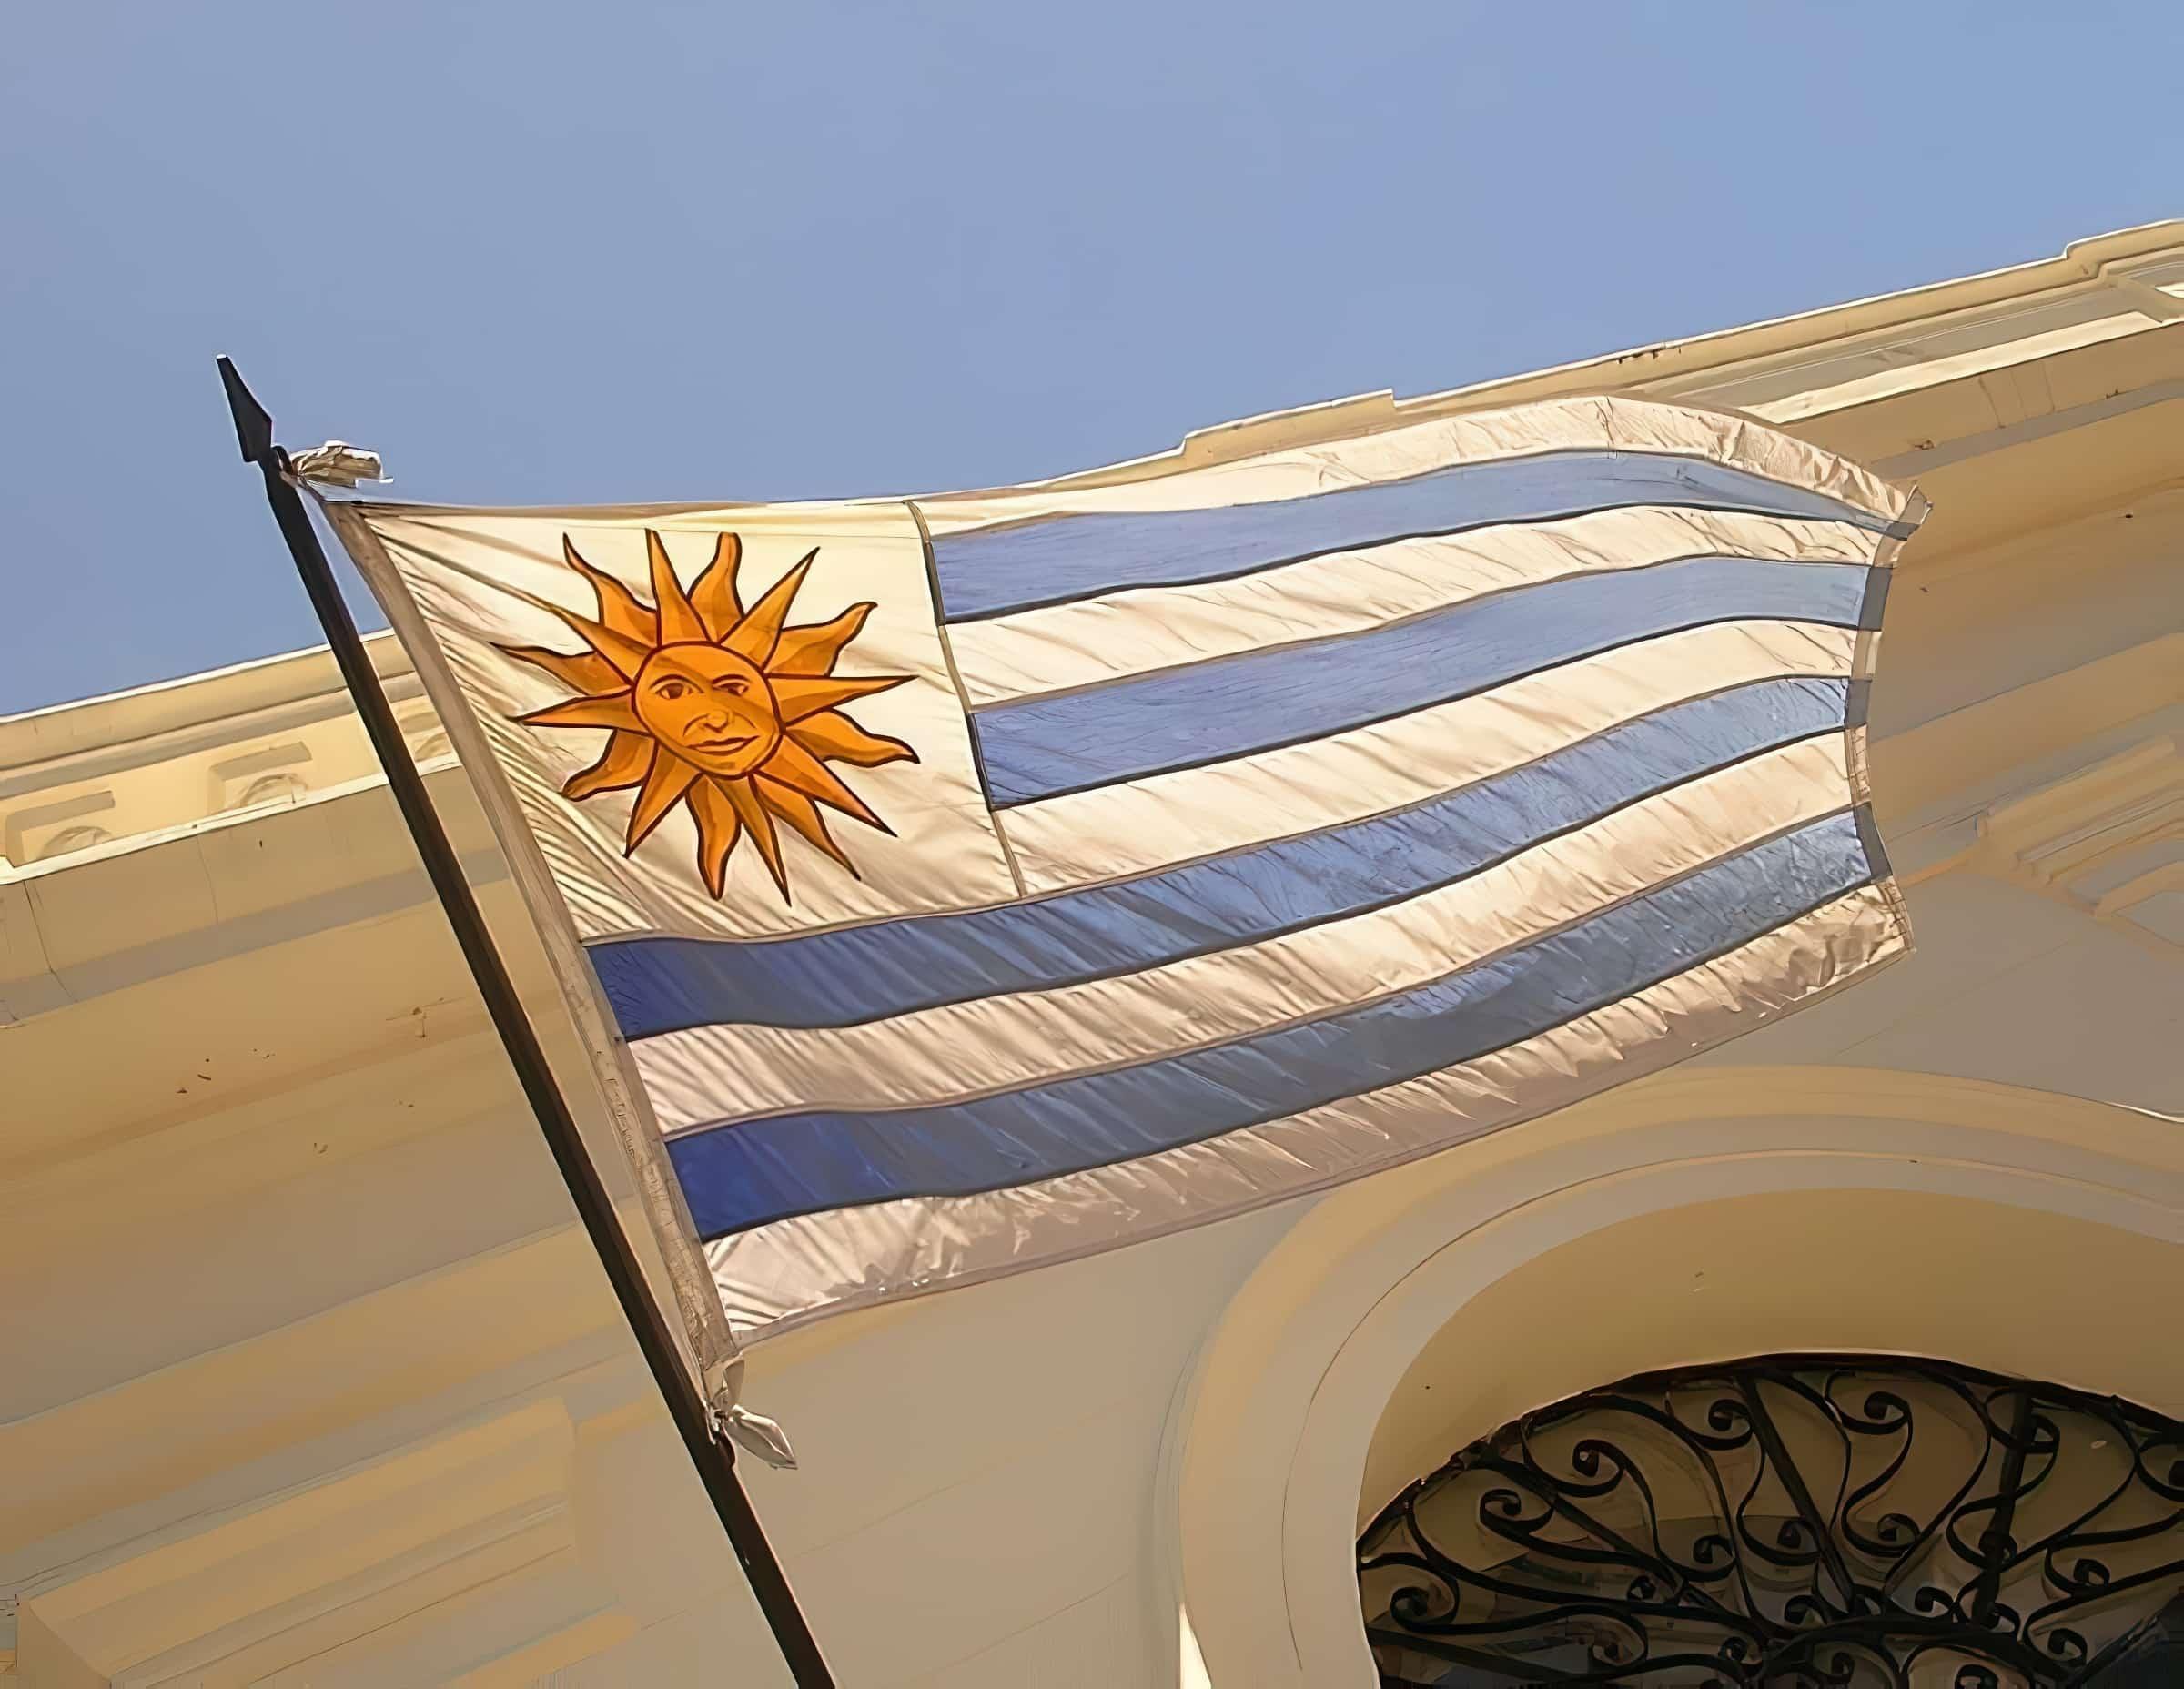 commons.wikimedia.org - José Porras